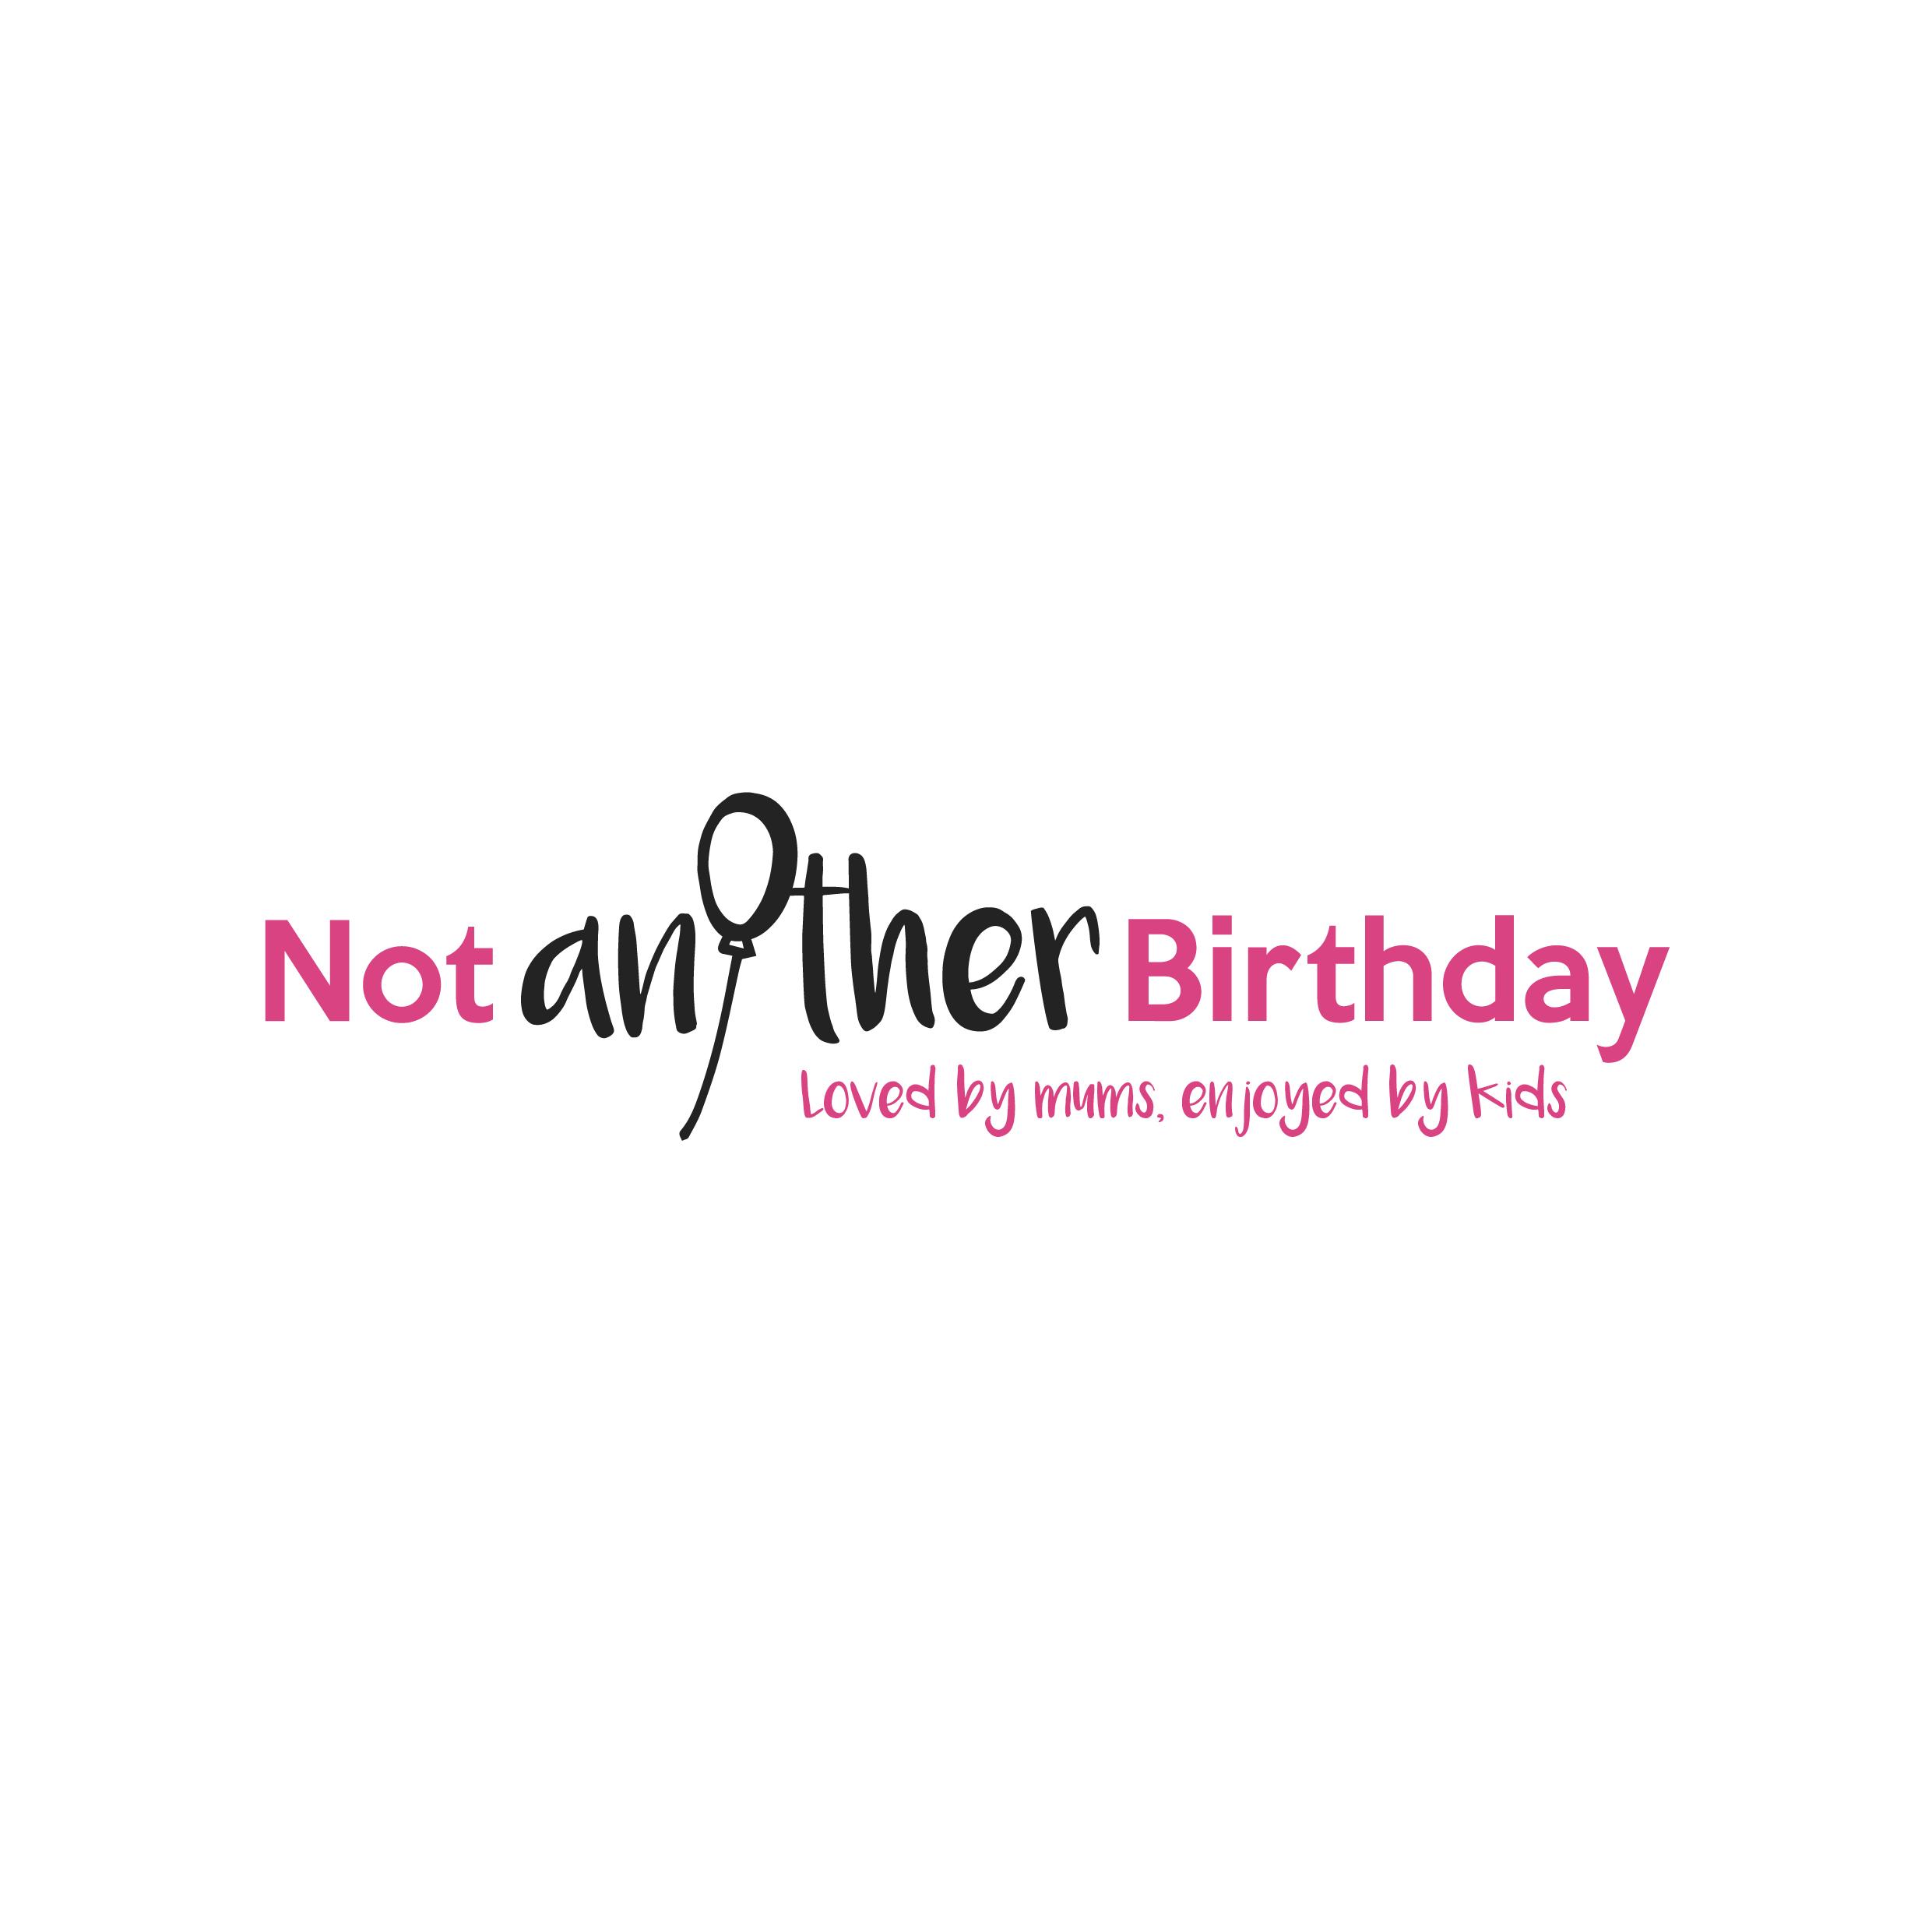 Not Another Birthday Logo Design-03.jpg